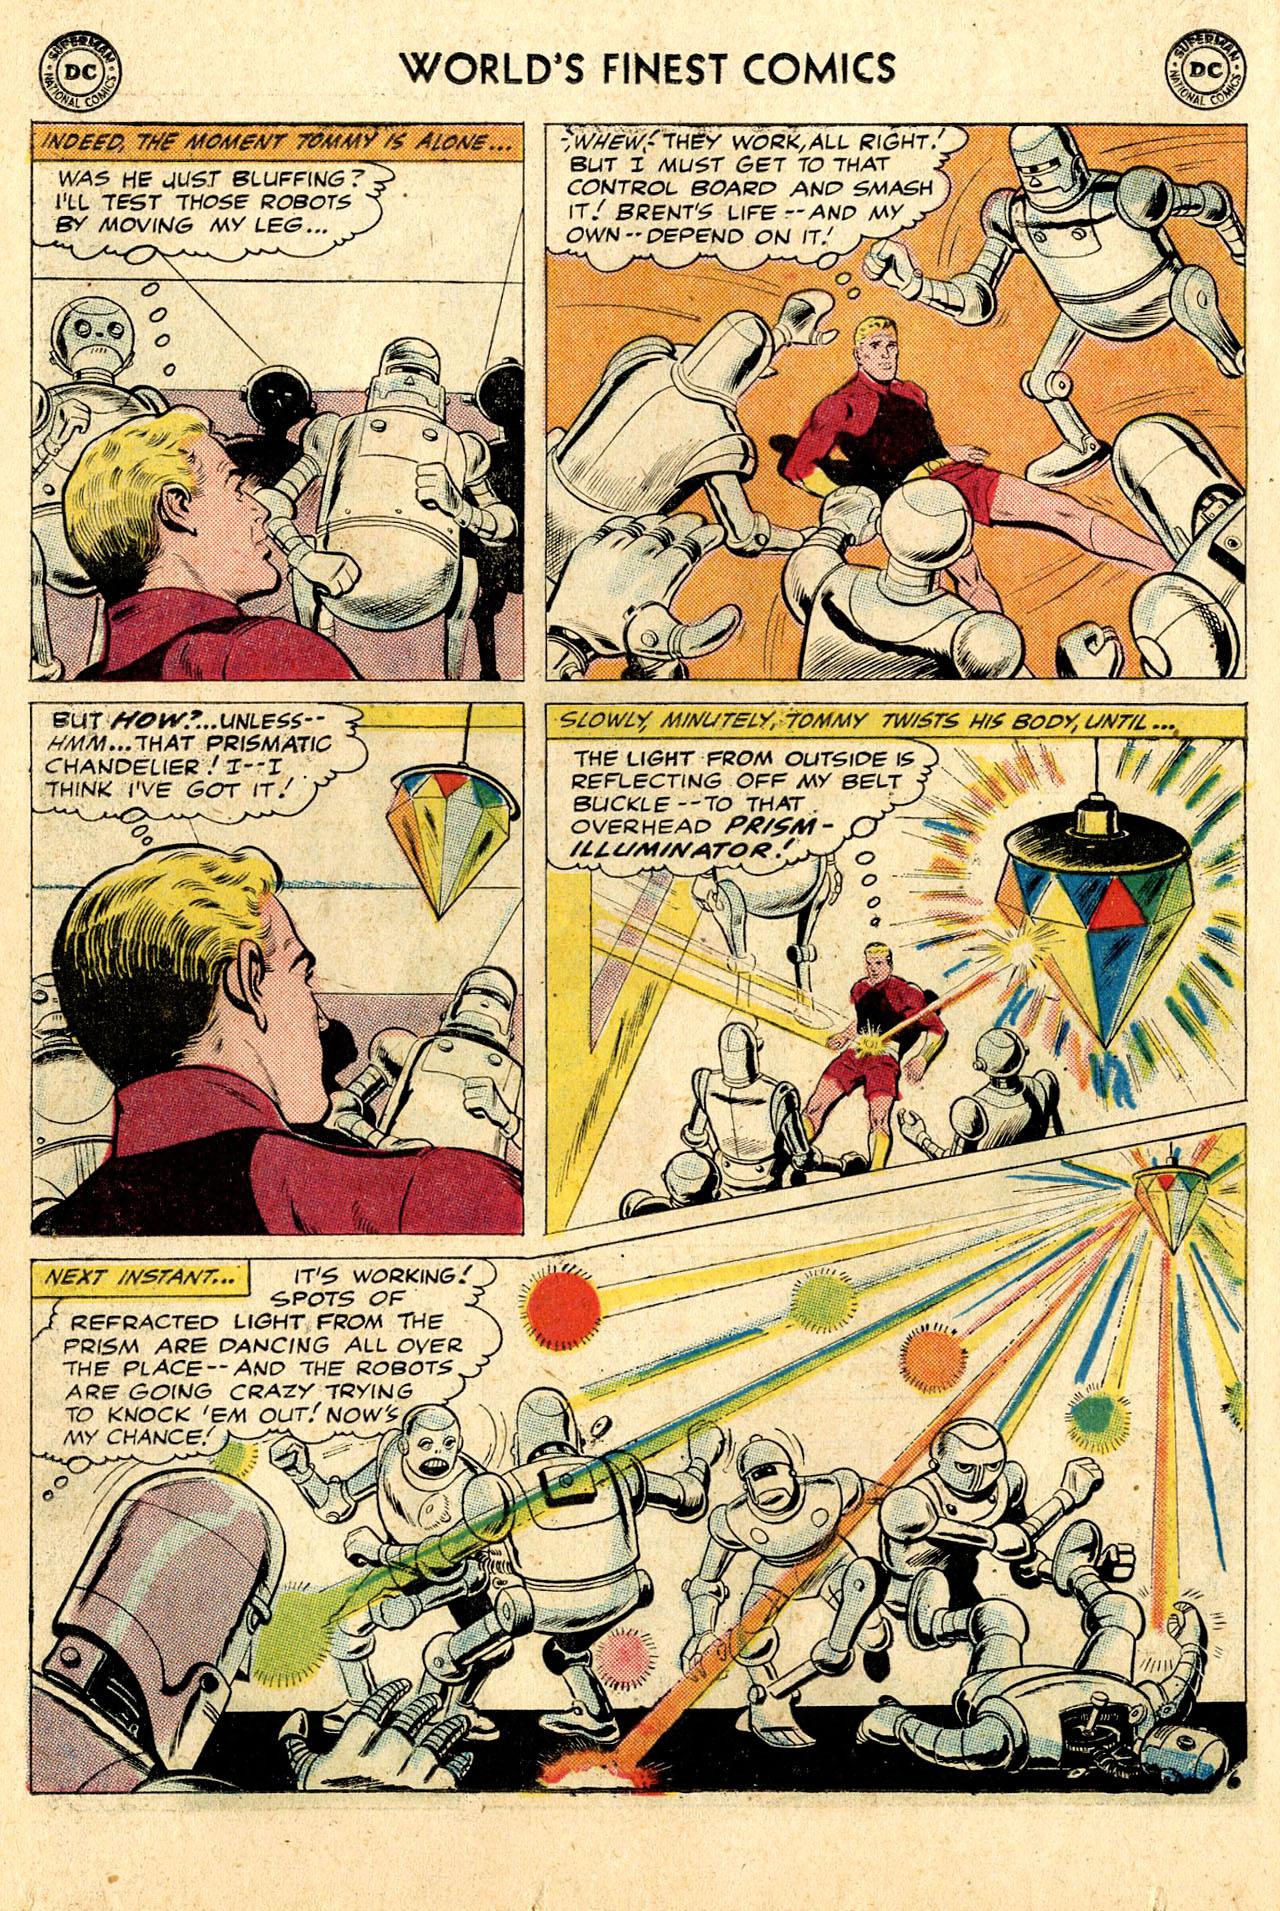 Read online World's Finest Comics comic -  Issue #110 - 22